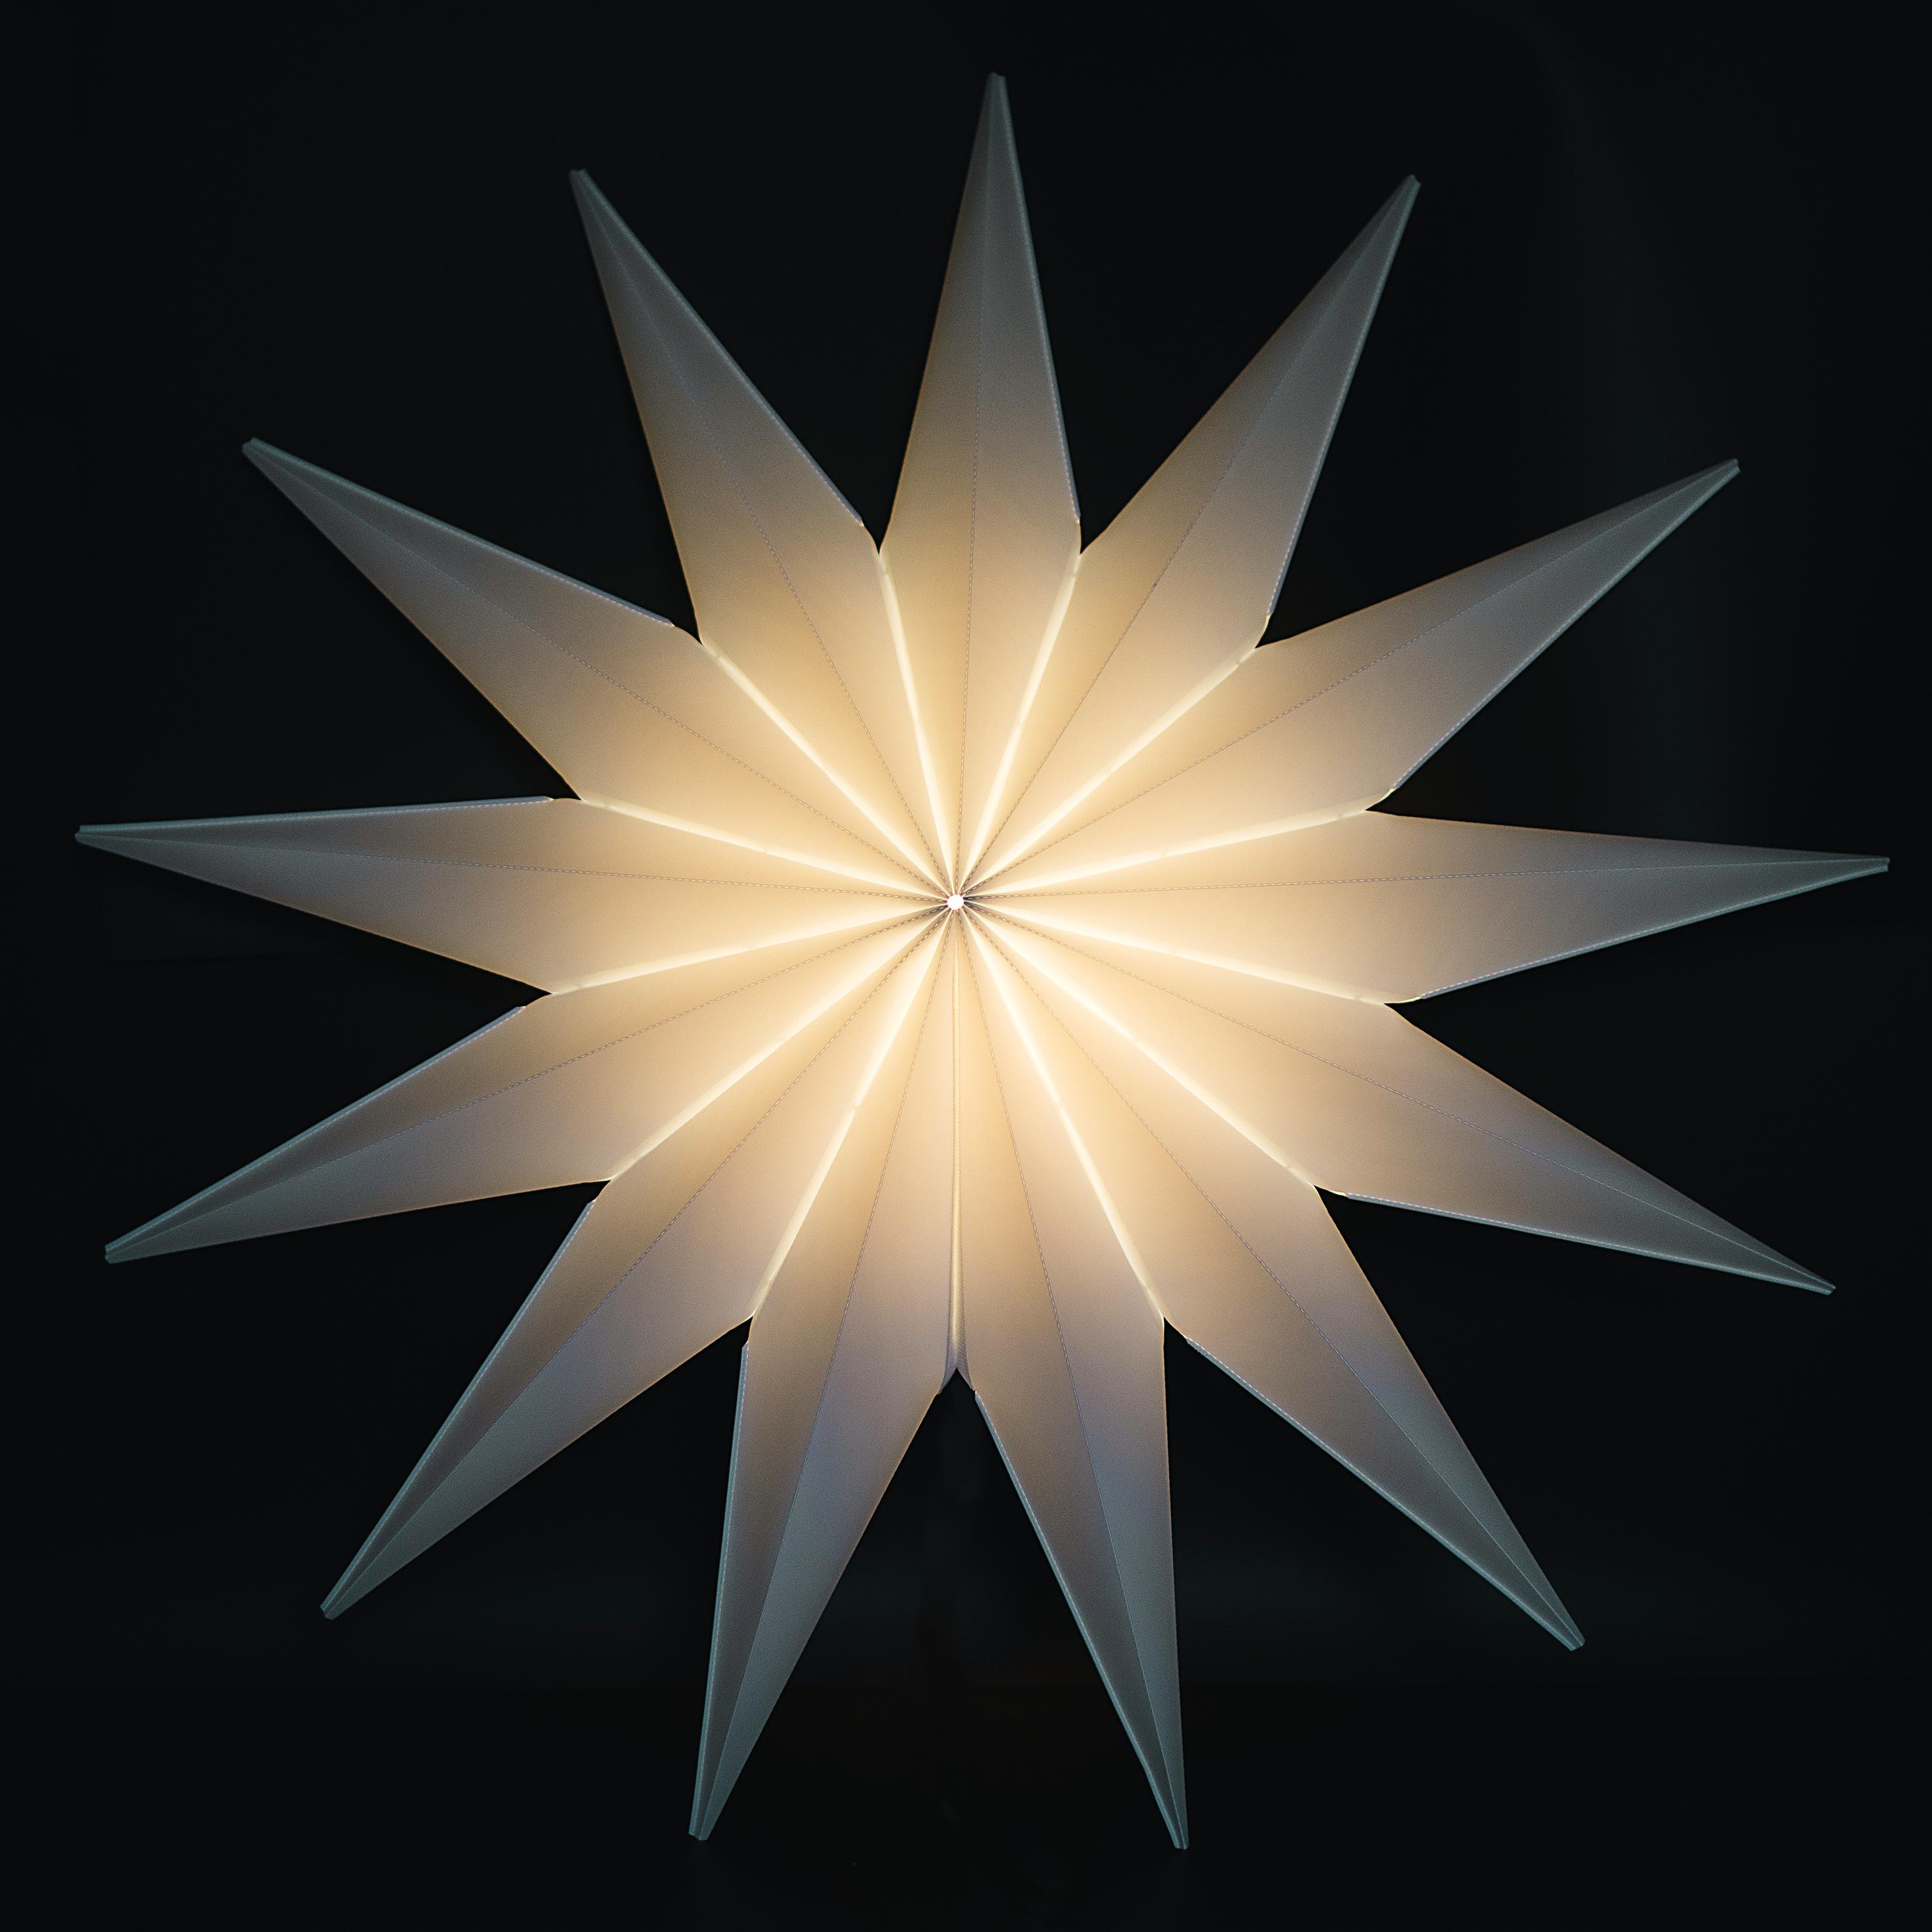 Starlight Weihnachtsbeleuchtung.Starlight North 100 Frutiger Display Ag Dekorationskonzept